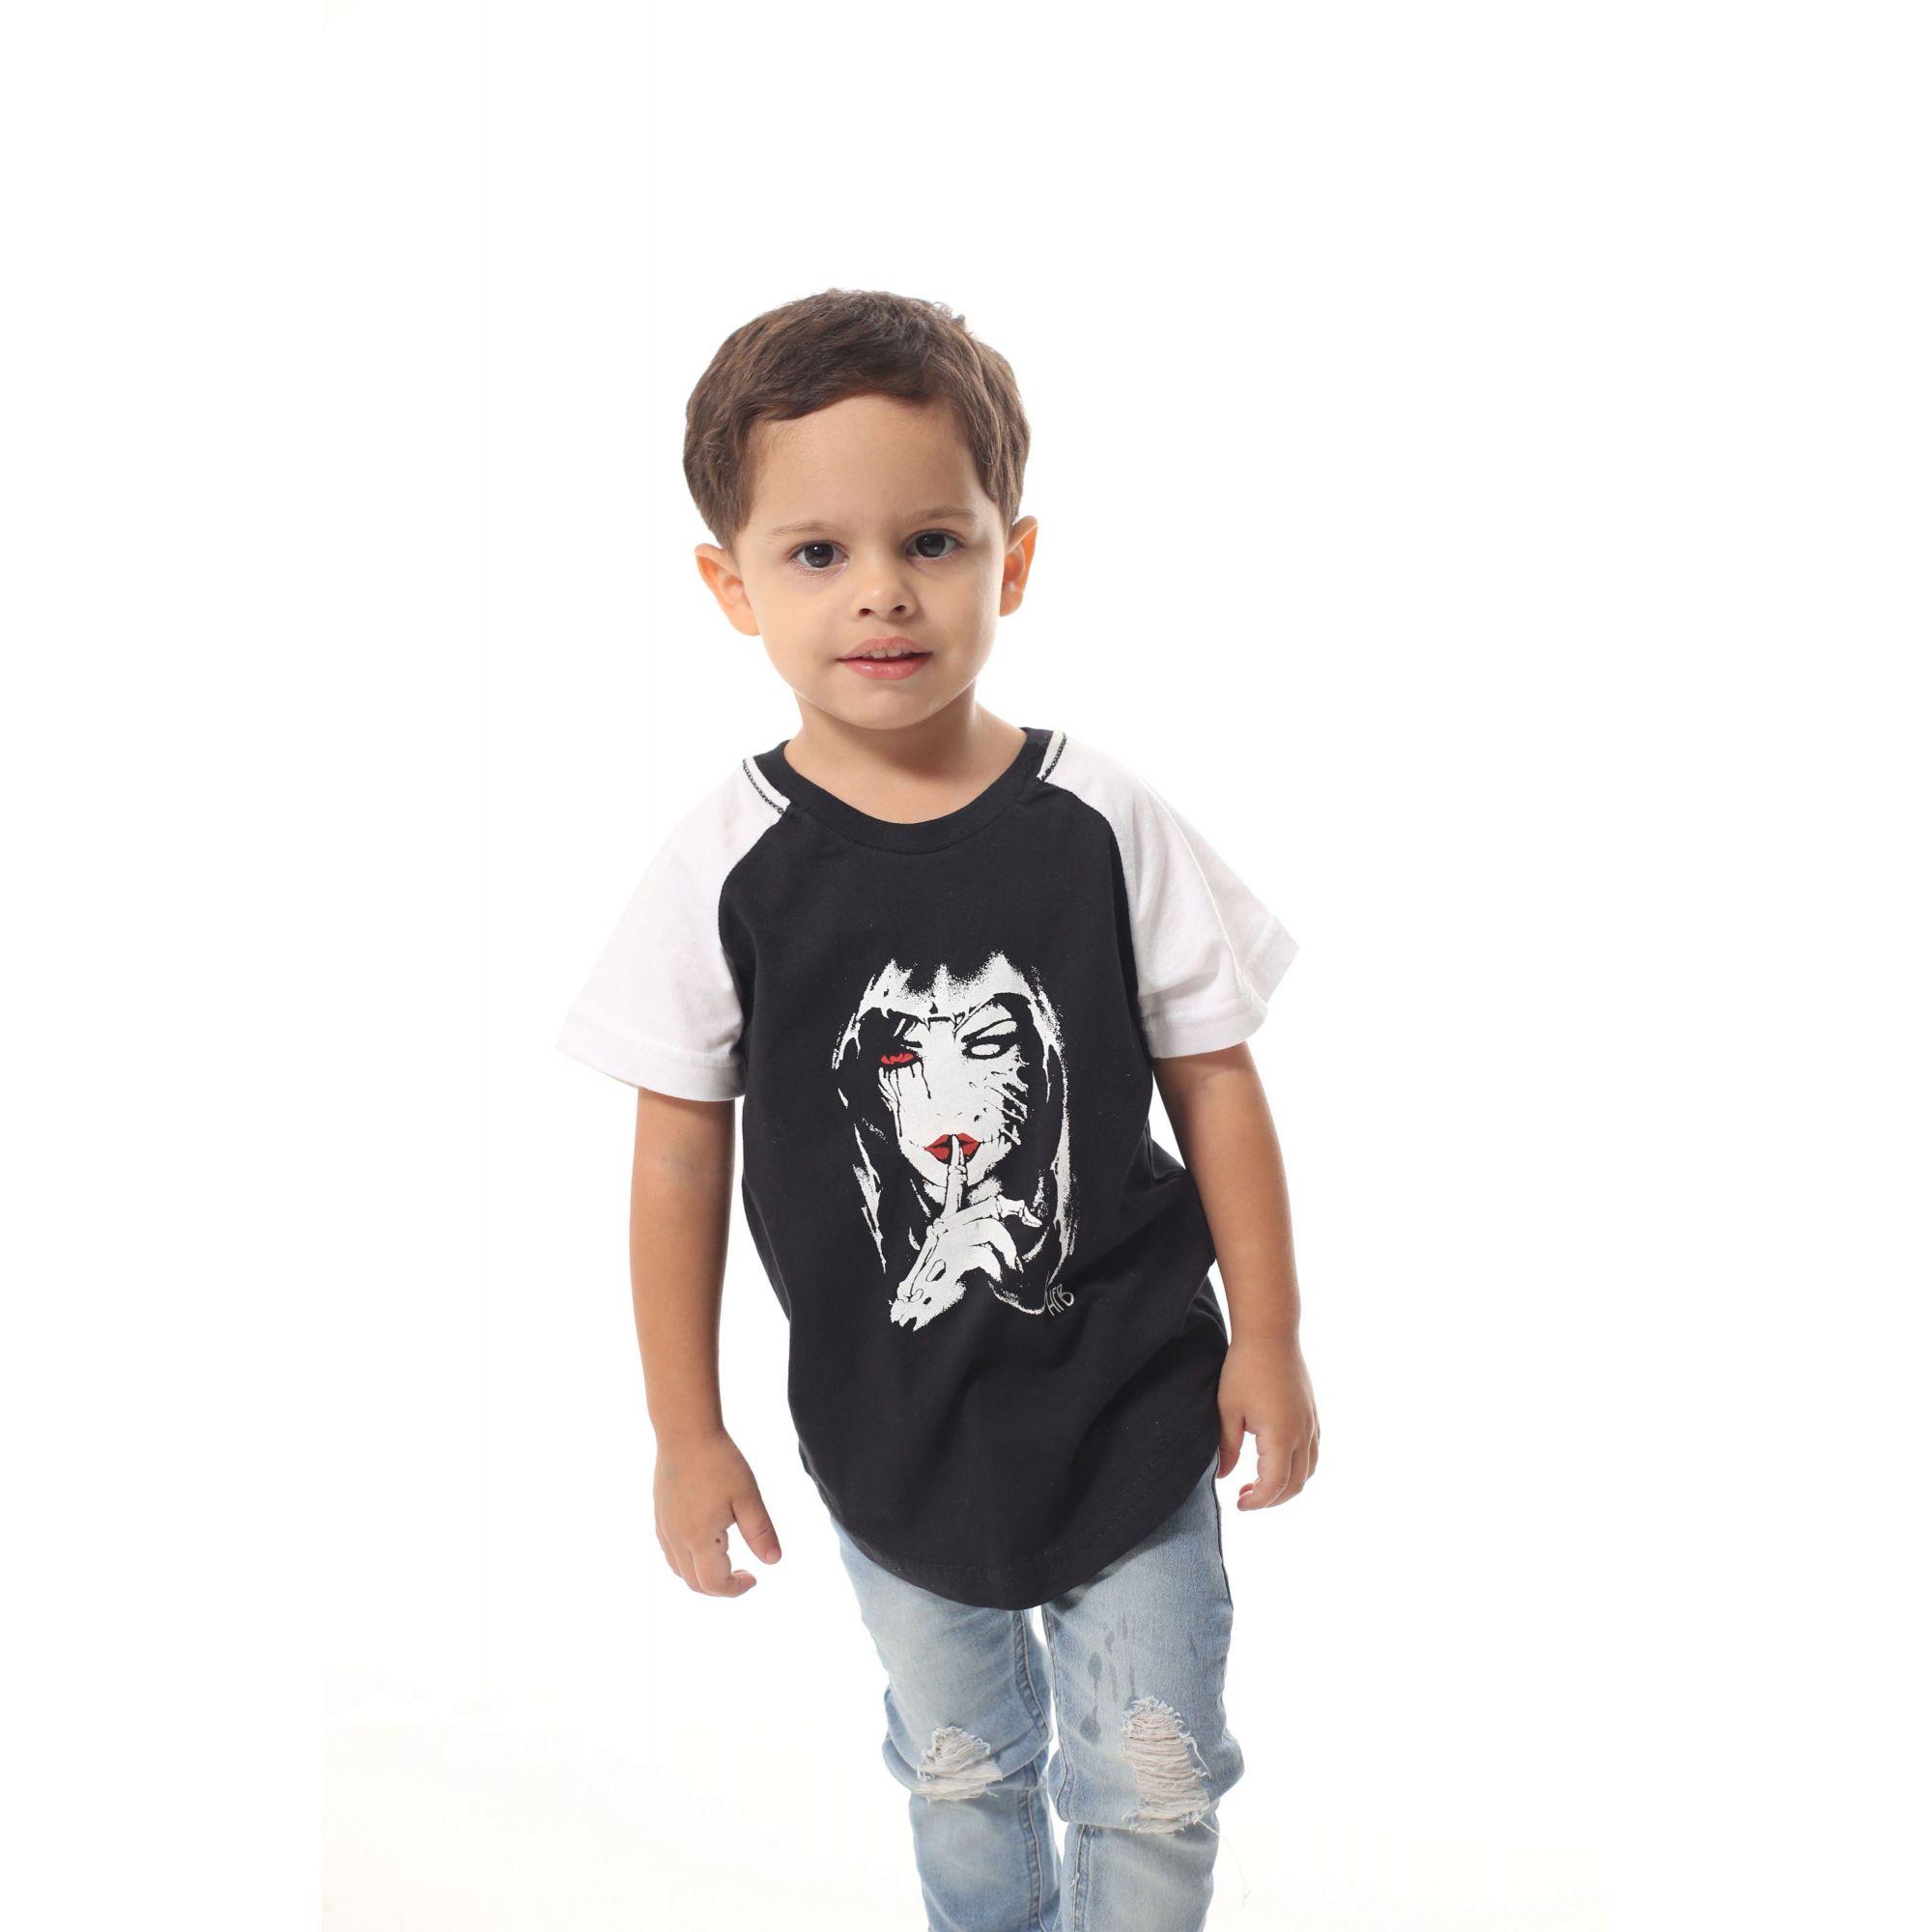 Camiseta Raglan Long Infantil Masculina Silencio  - Heitor Fashion Brazil